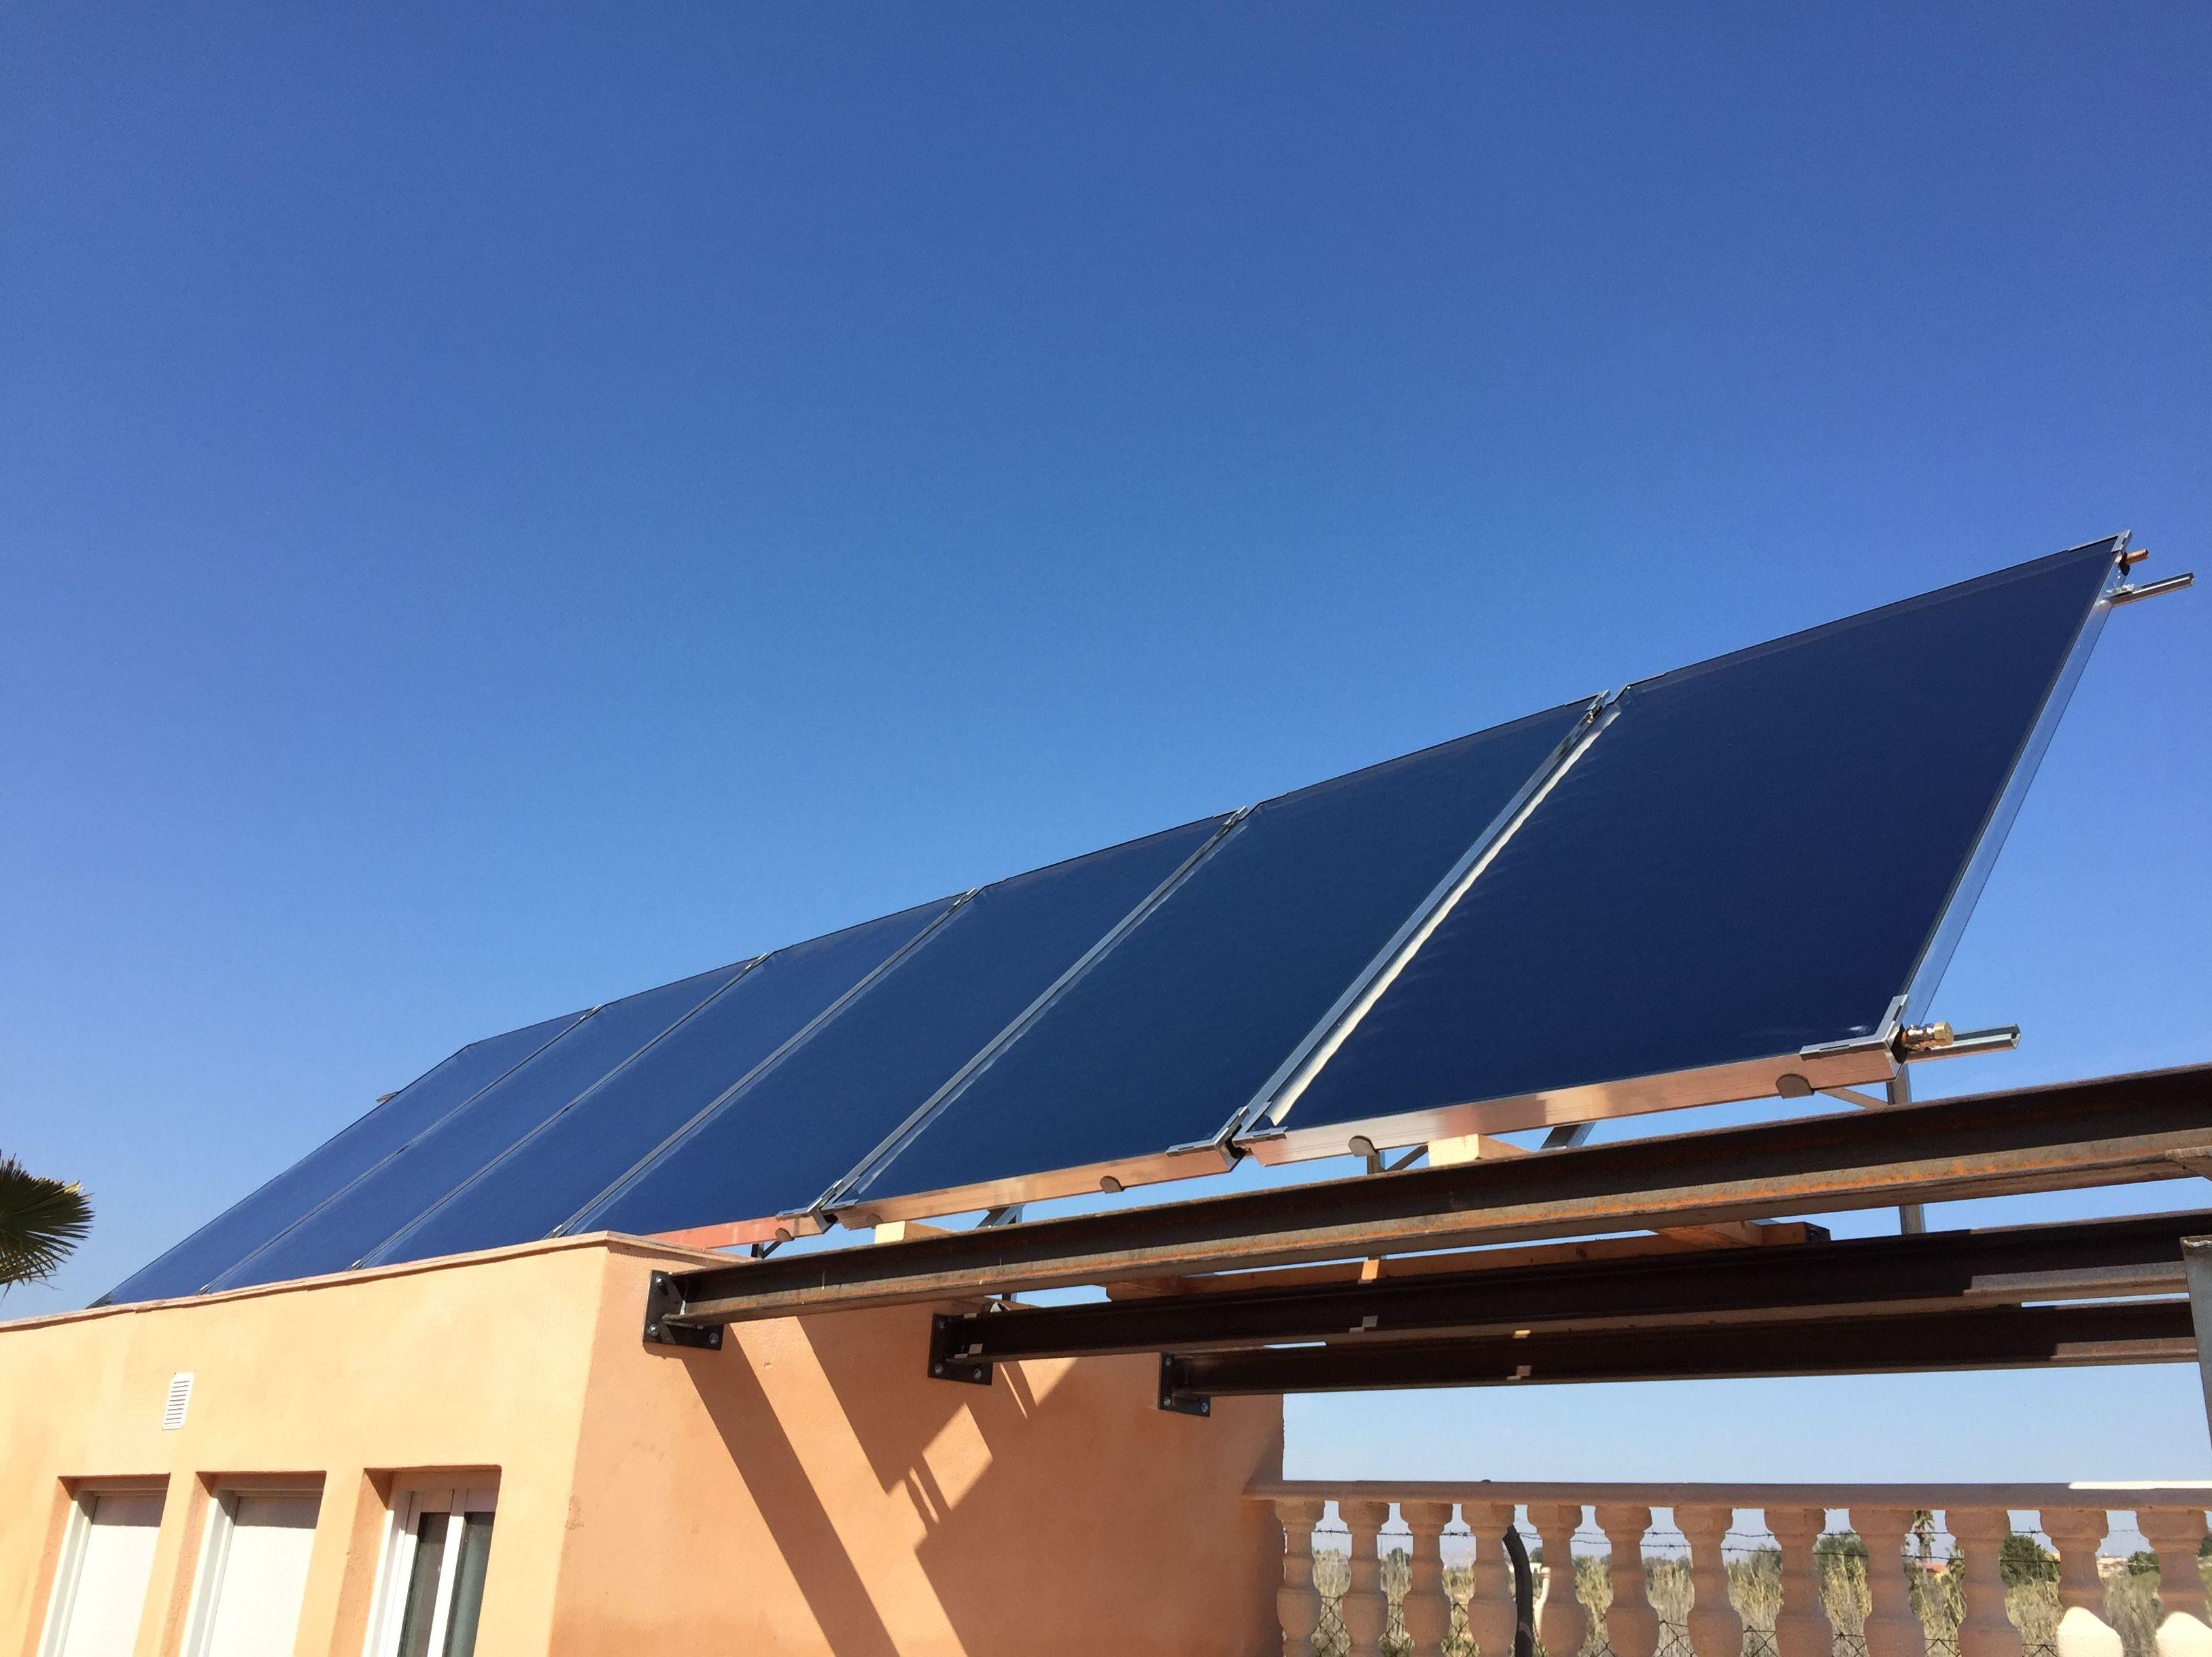 Foto 14 de Energías renovables en Ondara | Energías Renovables HG